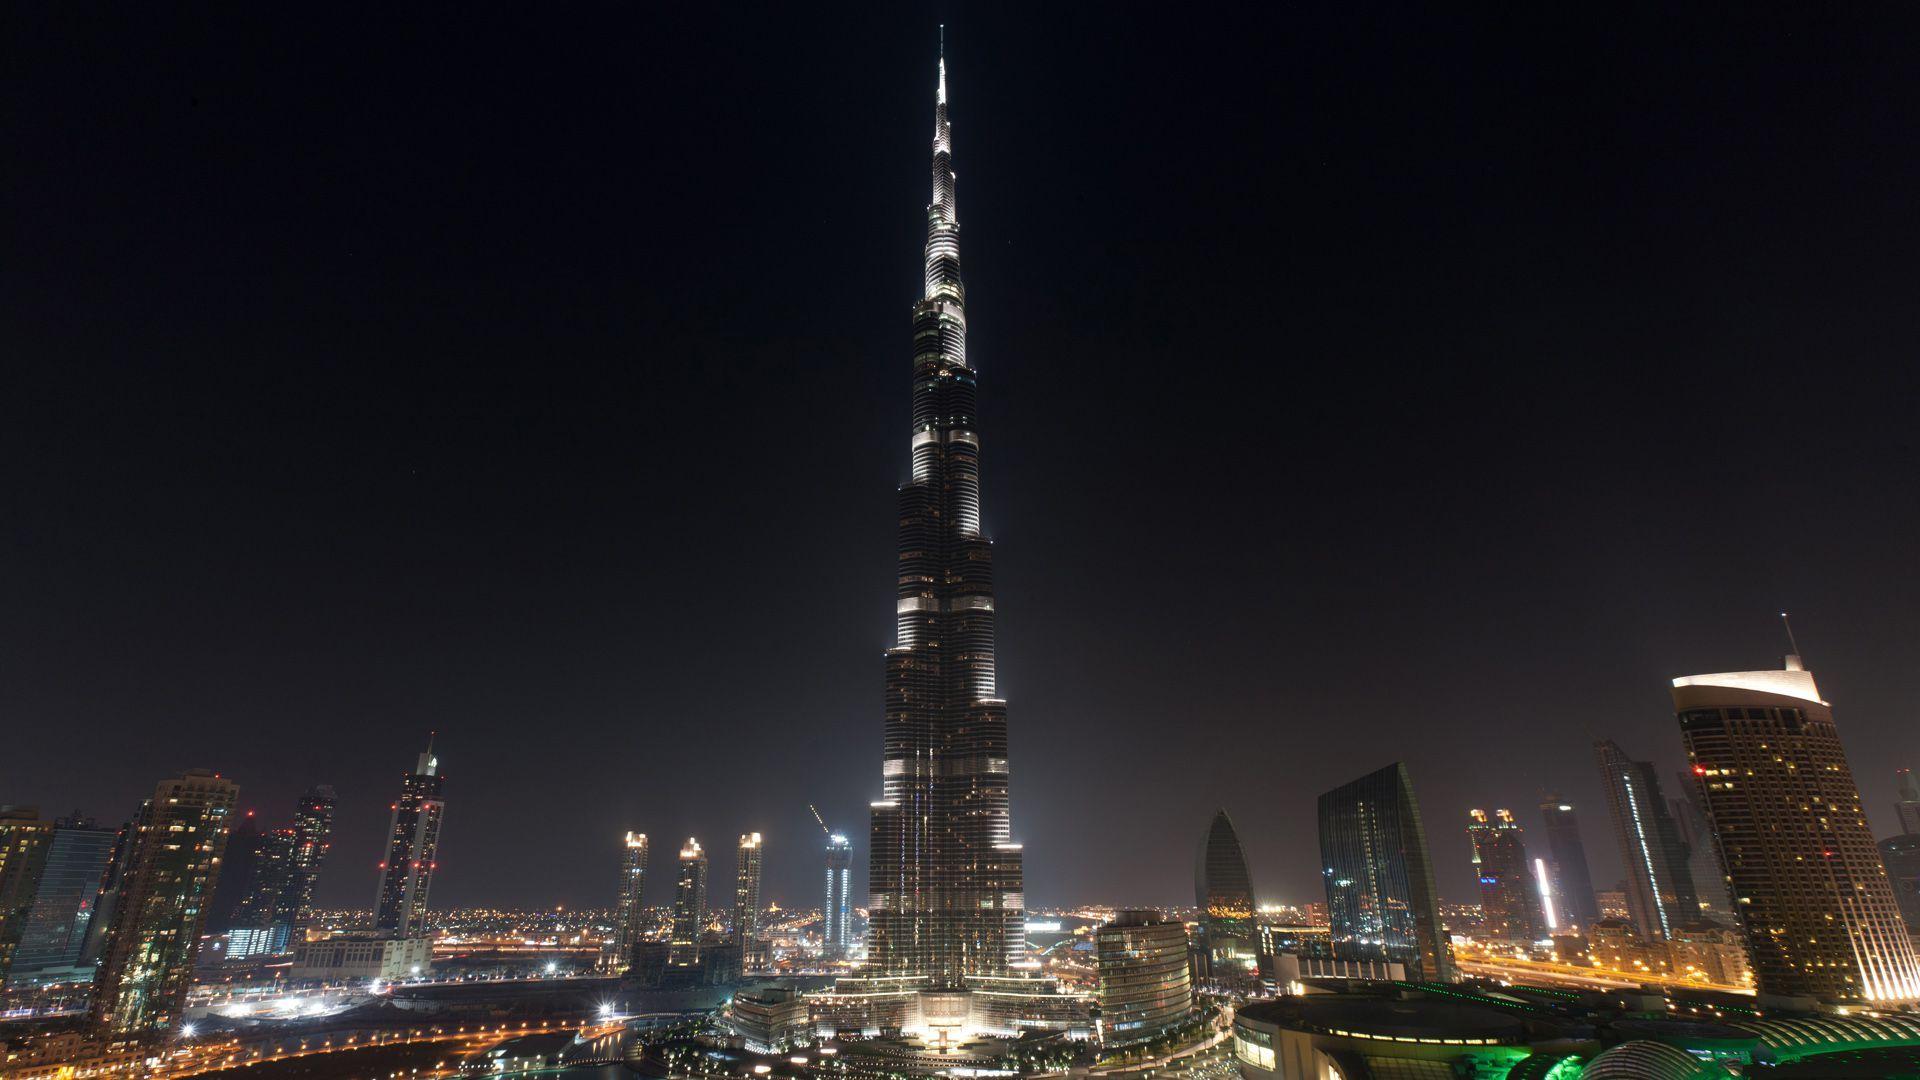 Burj Khalifa Hd Wallpapers Backgrounds Wallpaper 1280 838 Burj Khalifa Hd Desktop Wallpapers 48 Wallpapers A Burj Khalifa Famous Buildings Khalifa Dubai Burj khalifa night view hd wallpaper